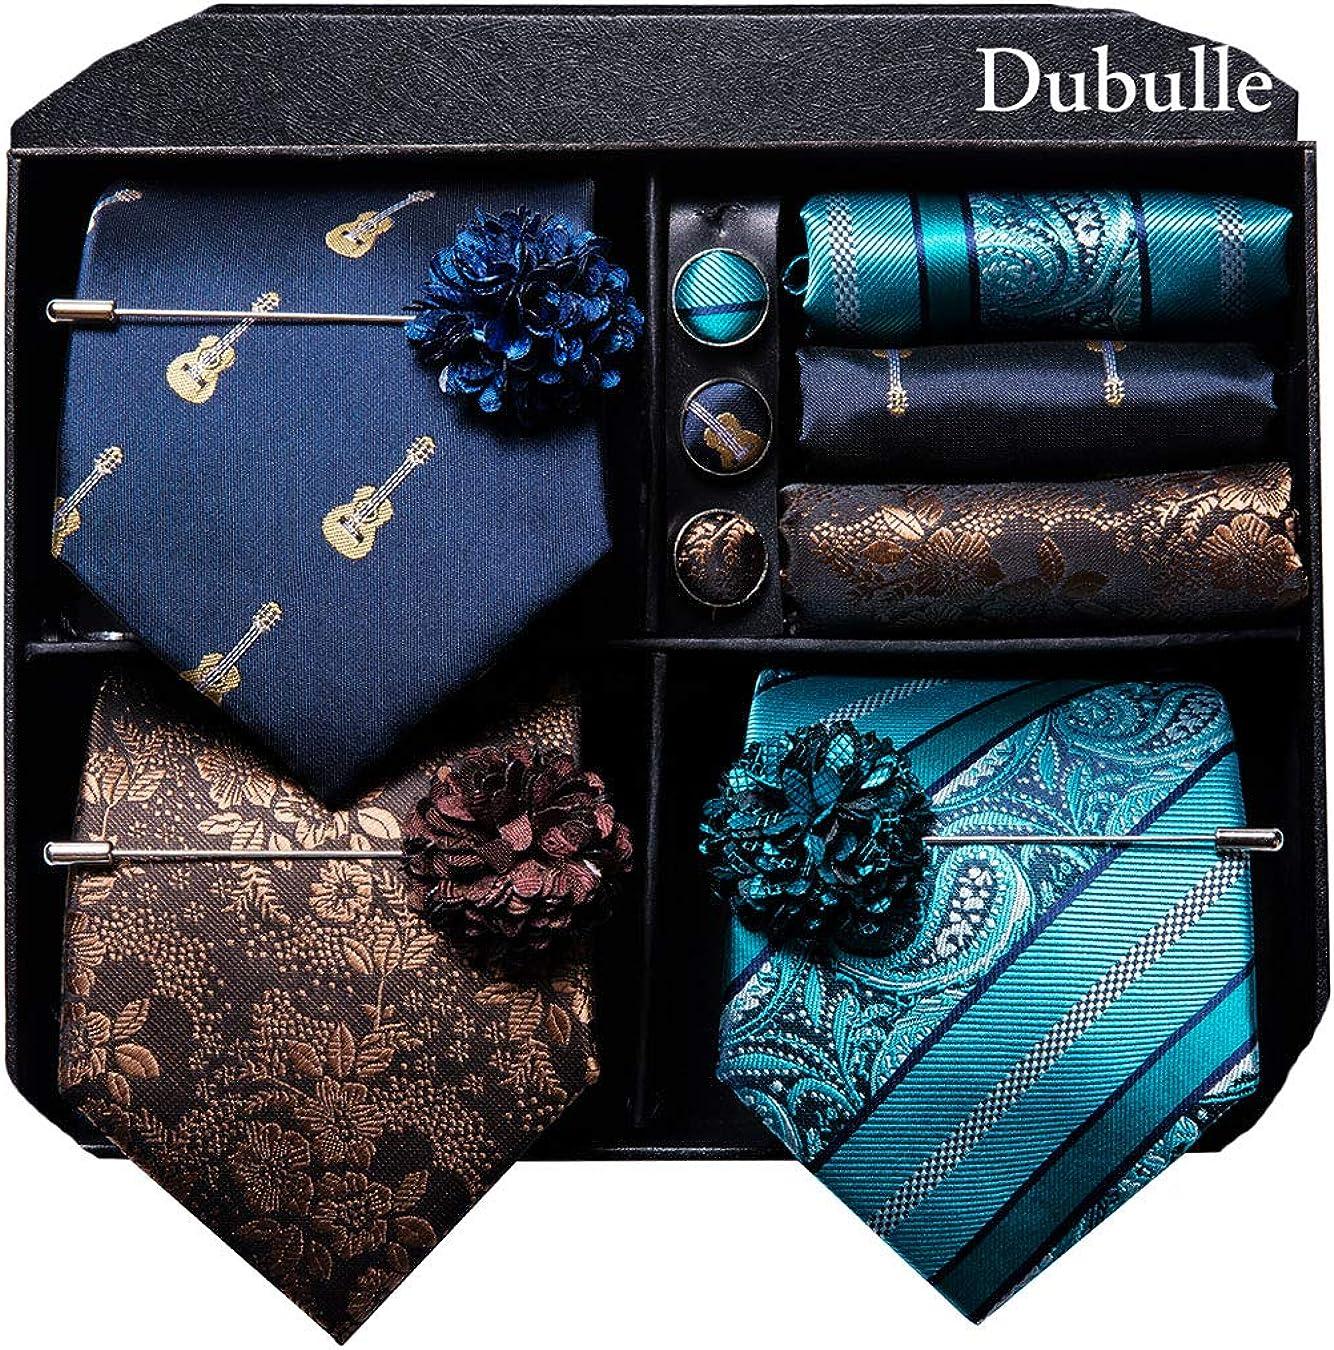 Dubulle Lot 3 PCS Classic Men's Silk Tie Set Paisley Stripe Necktie for Men Pocket Square Gift Box Multiple Sets